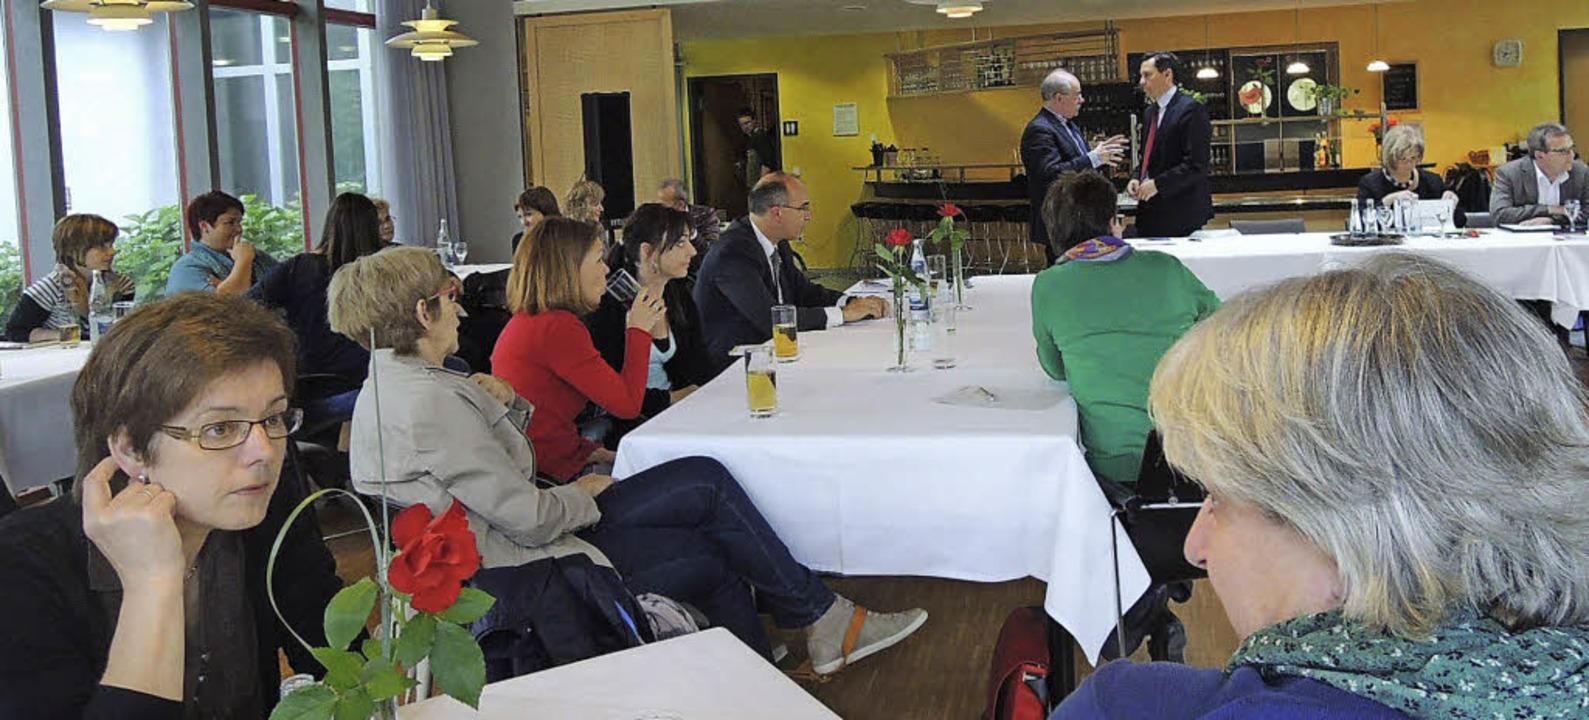 Angeregte Diskussionen prägten das dritte SPD-Forum Bildung.   | Foto: Kurt Meier